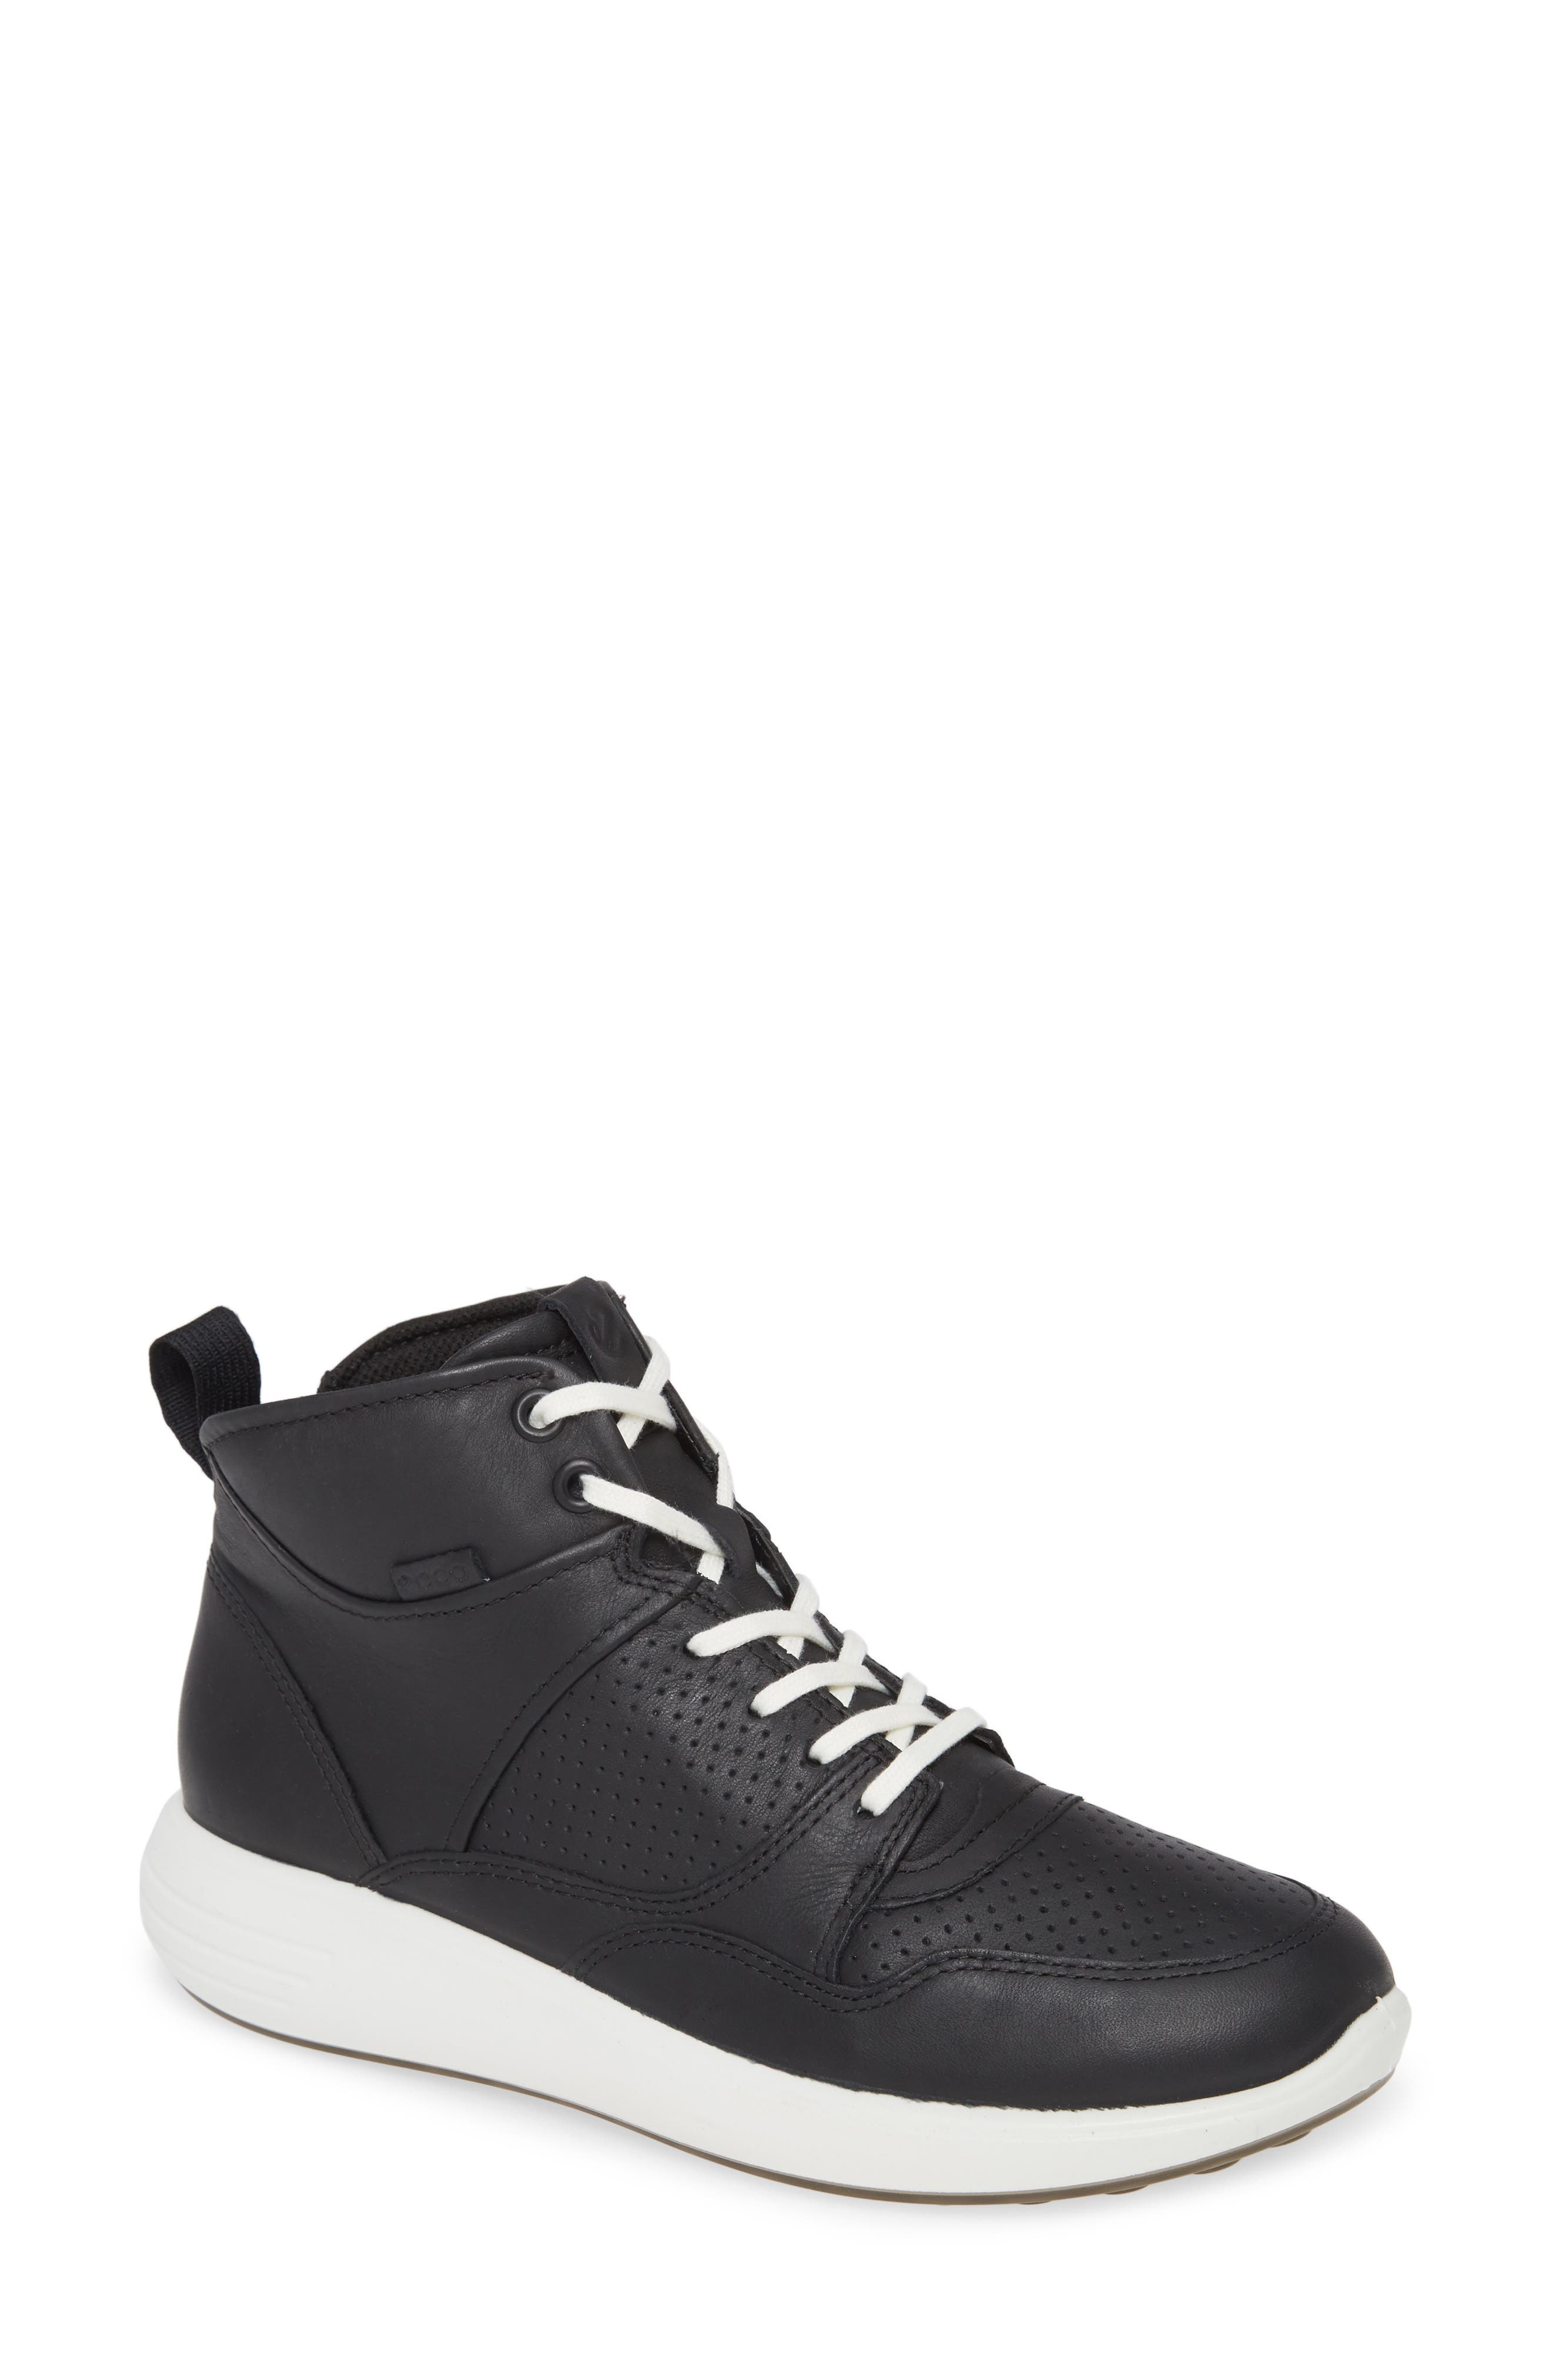 ECCO Soft 7 Runner Sneaker Boot (Women